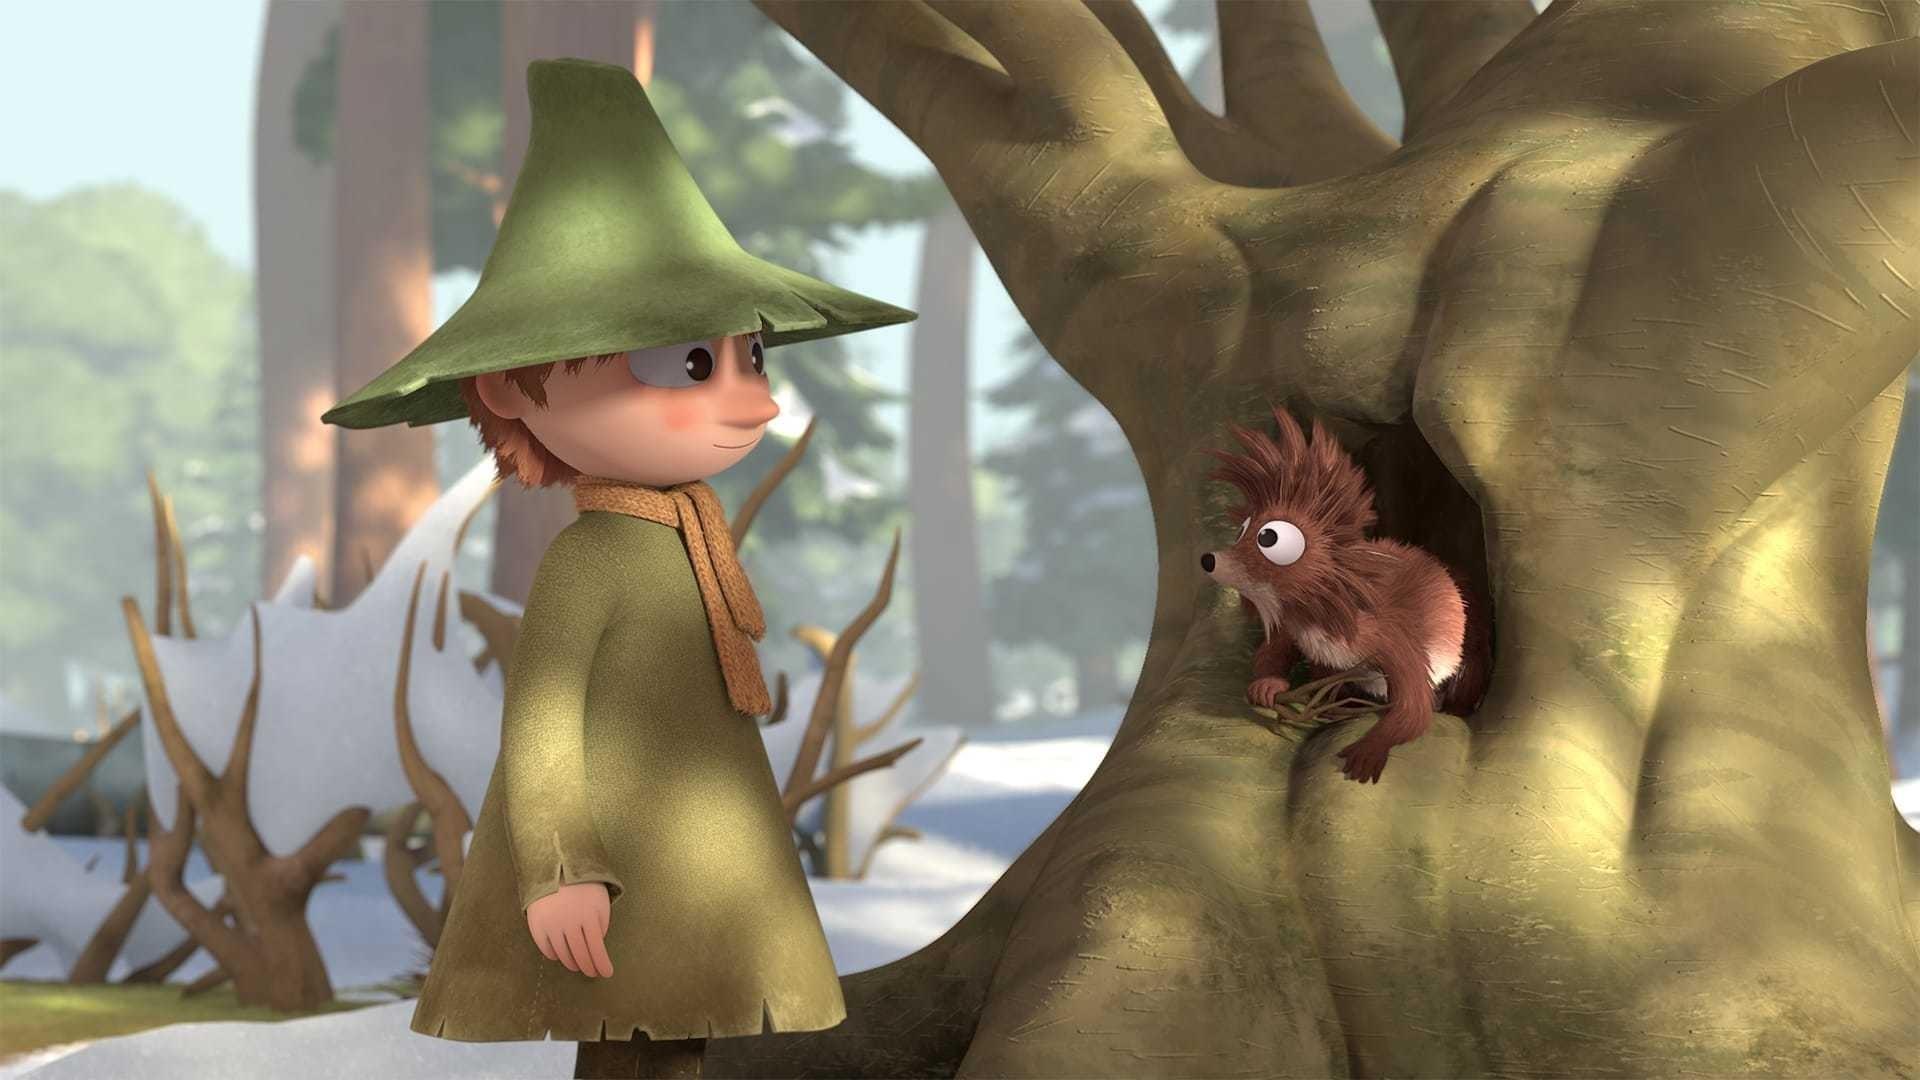 Moominvalley: Season 1 Episode 2 S01E02 Watch Openload Episodes Online